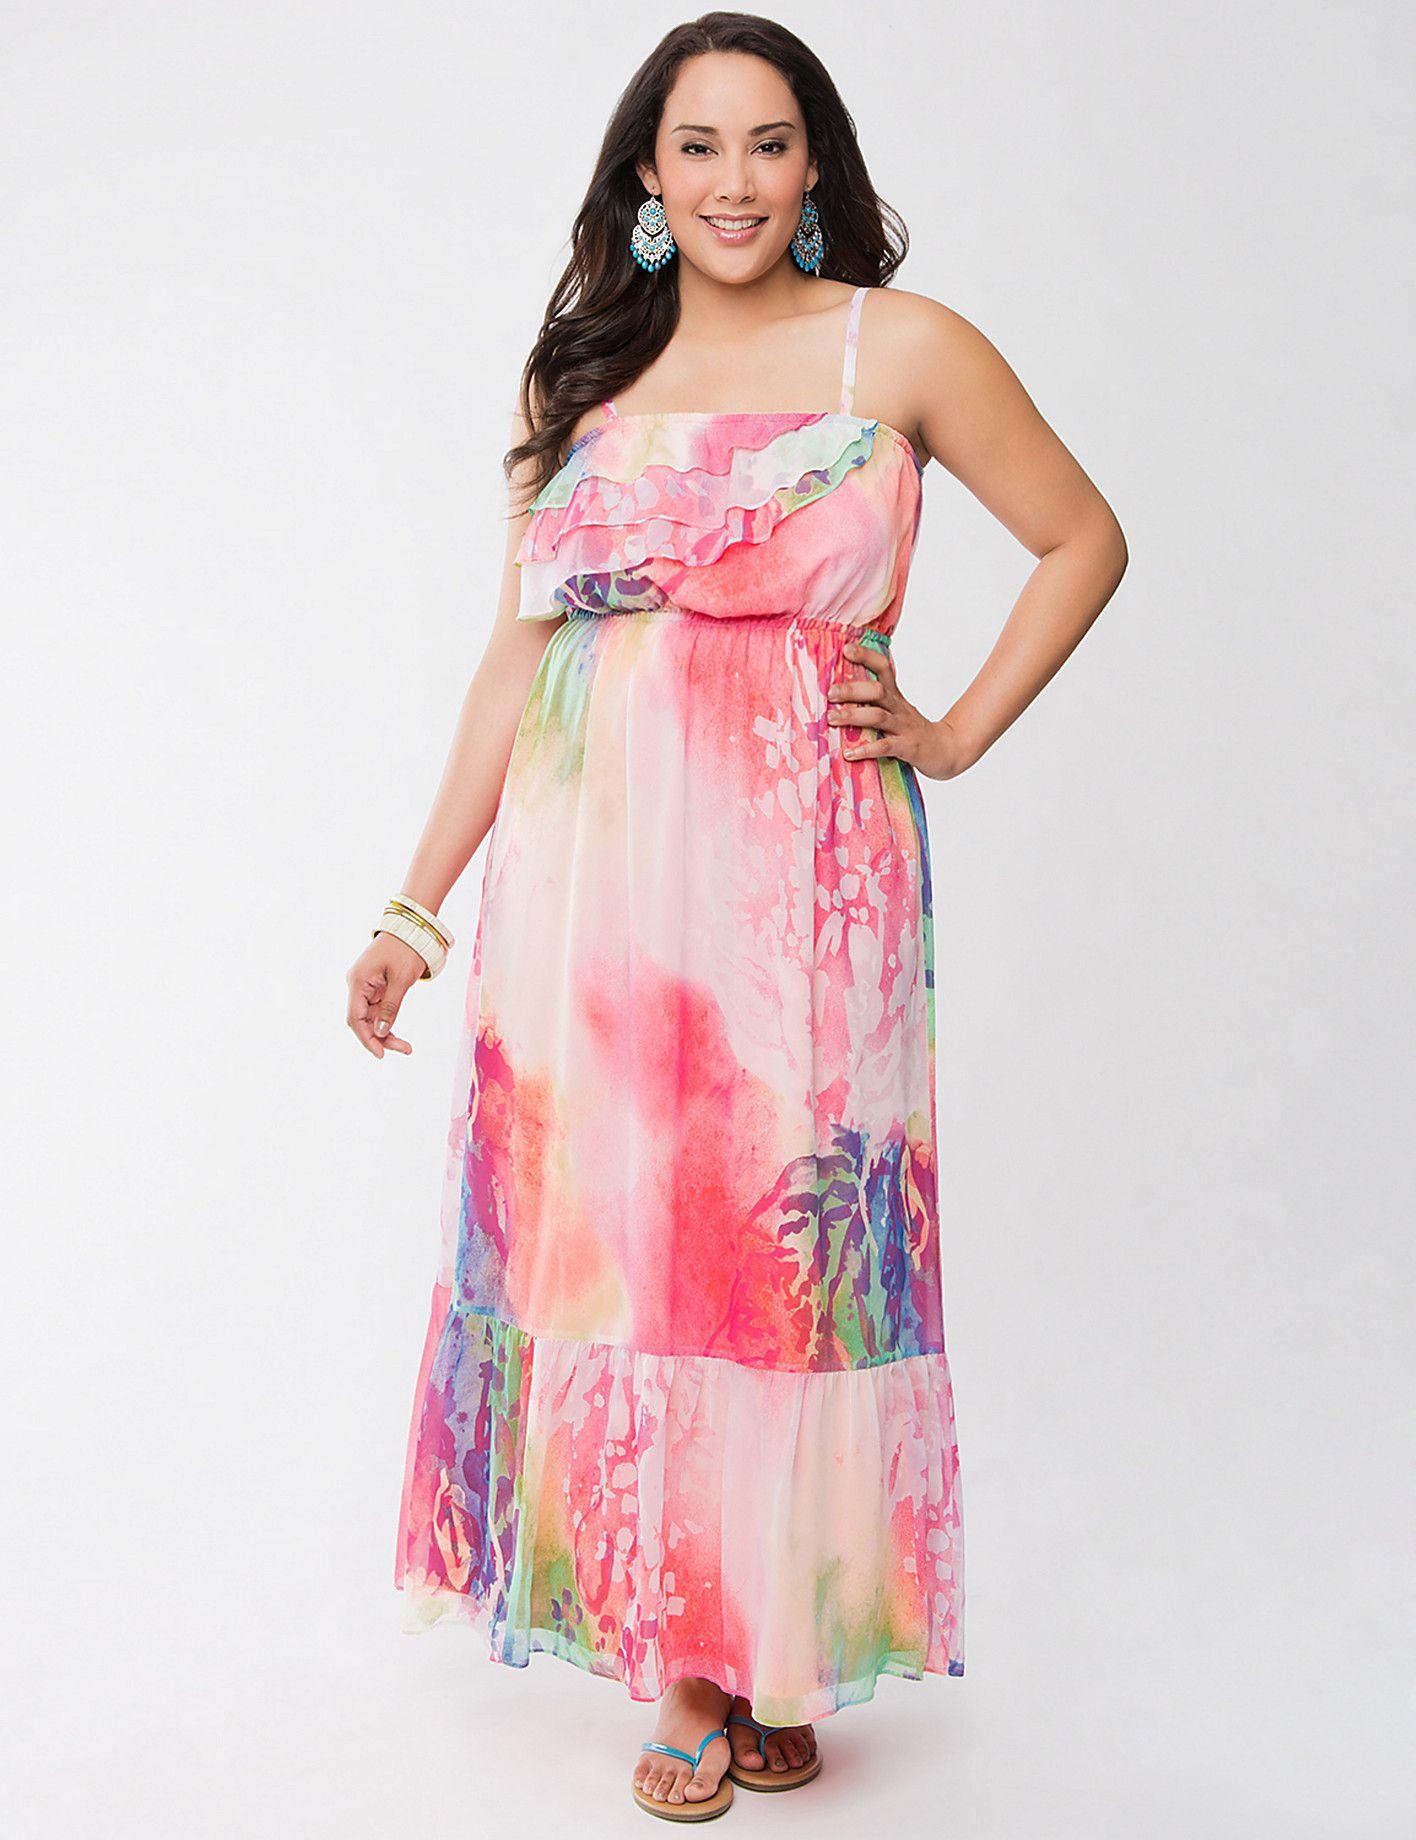 Smocked High Low Dress By Lane Bryant - Lane Bryant